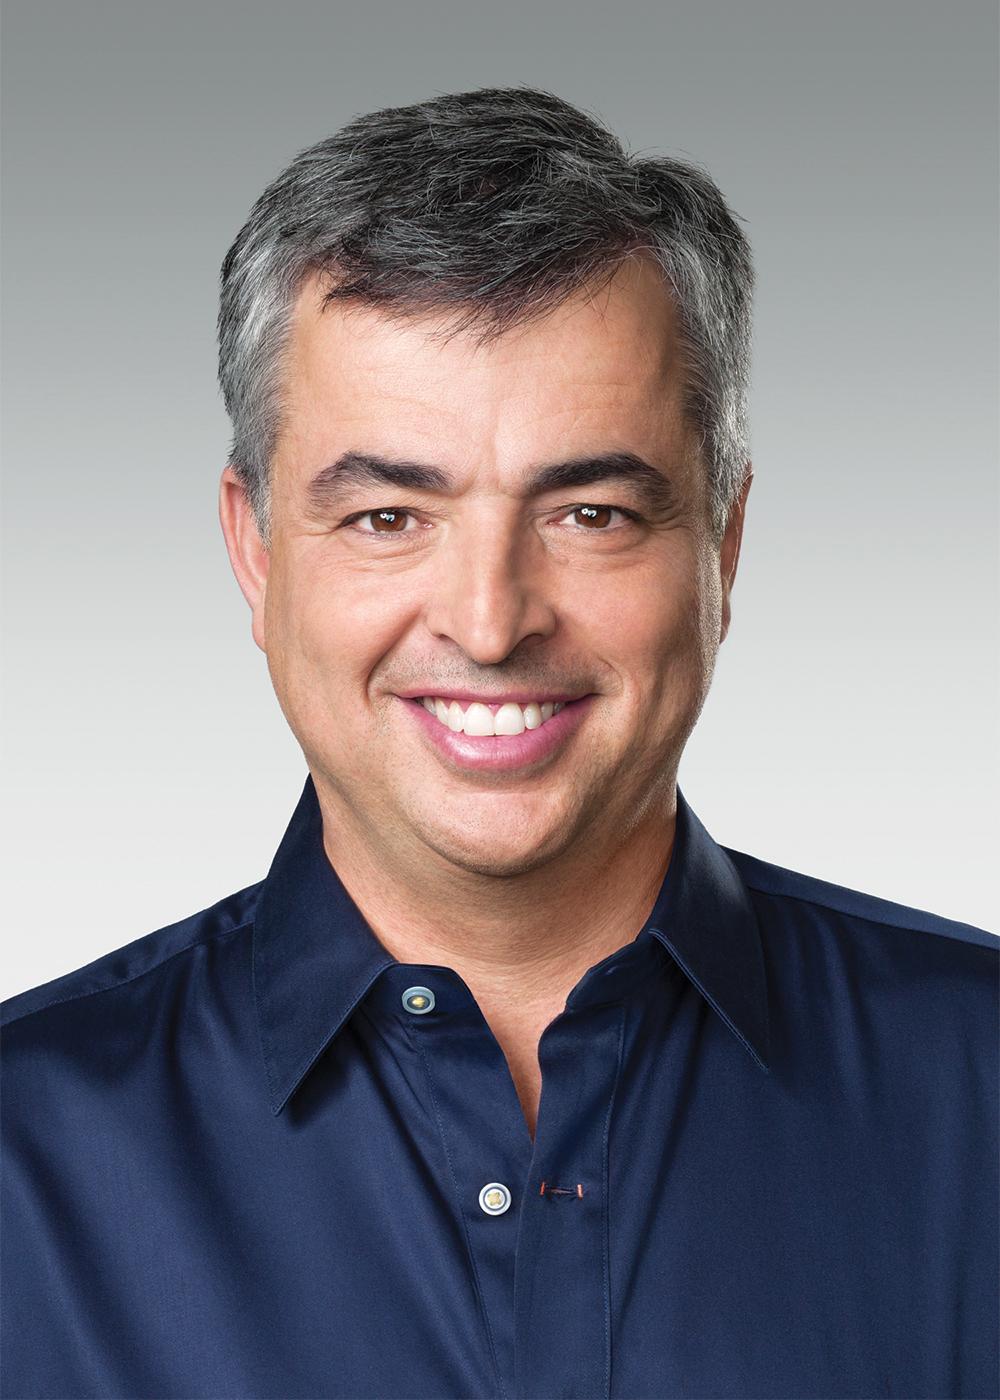 Executive Portrait of Eddy Cue